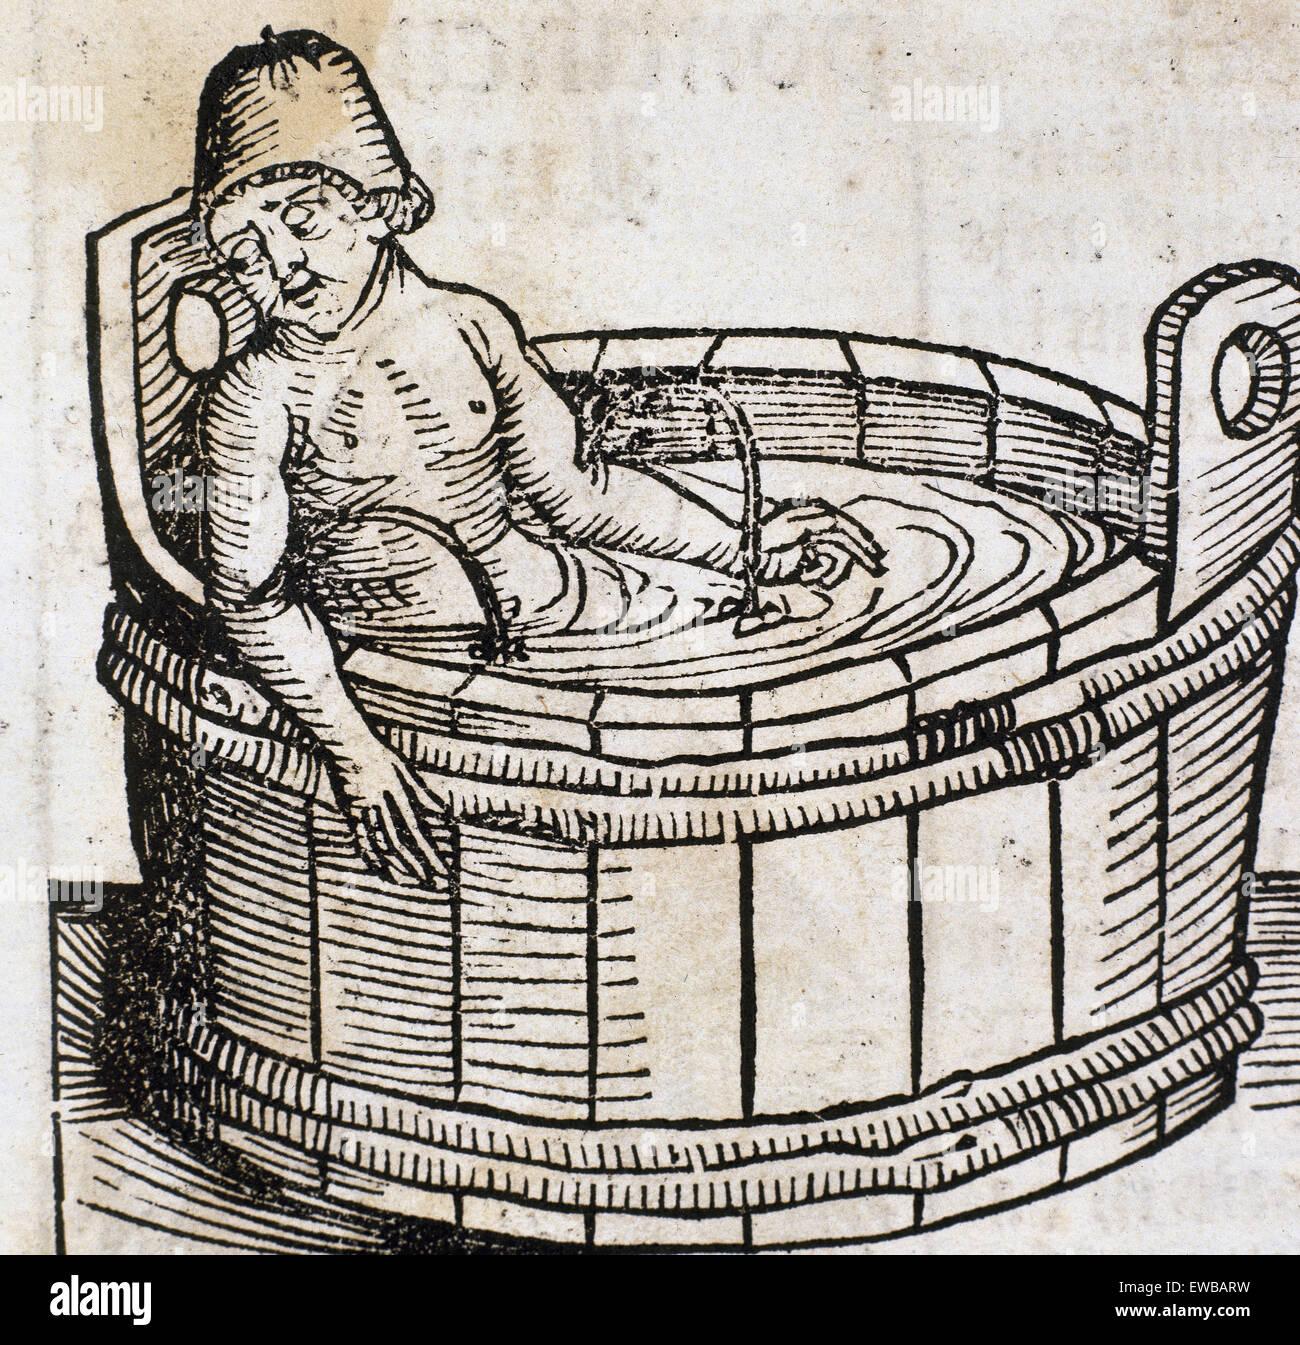 Seneca the Younger, (4 BC-65 AD). Roman Stoic philosopher, statesman and dramatist. Seneca slitting his wrists. - Stock Image